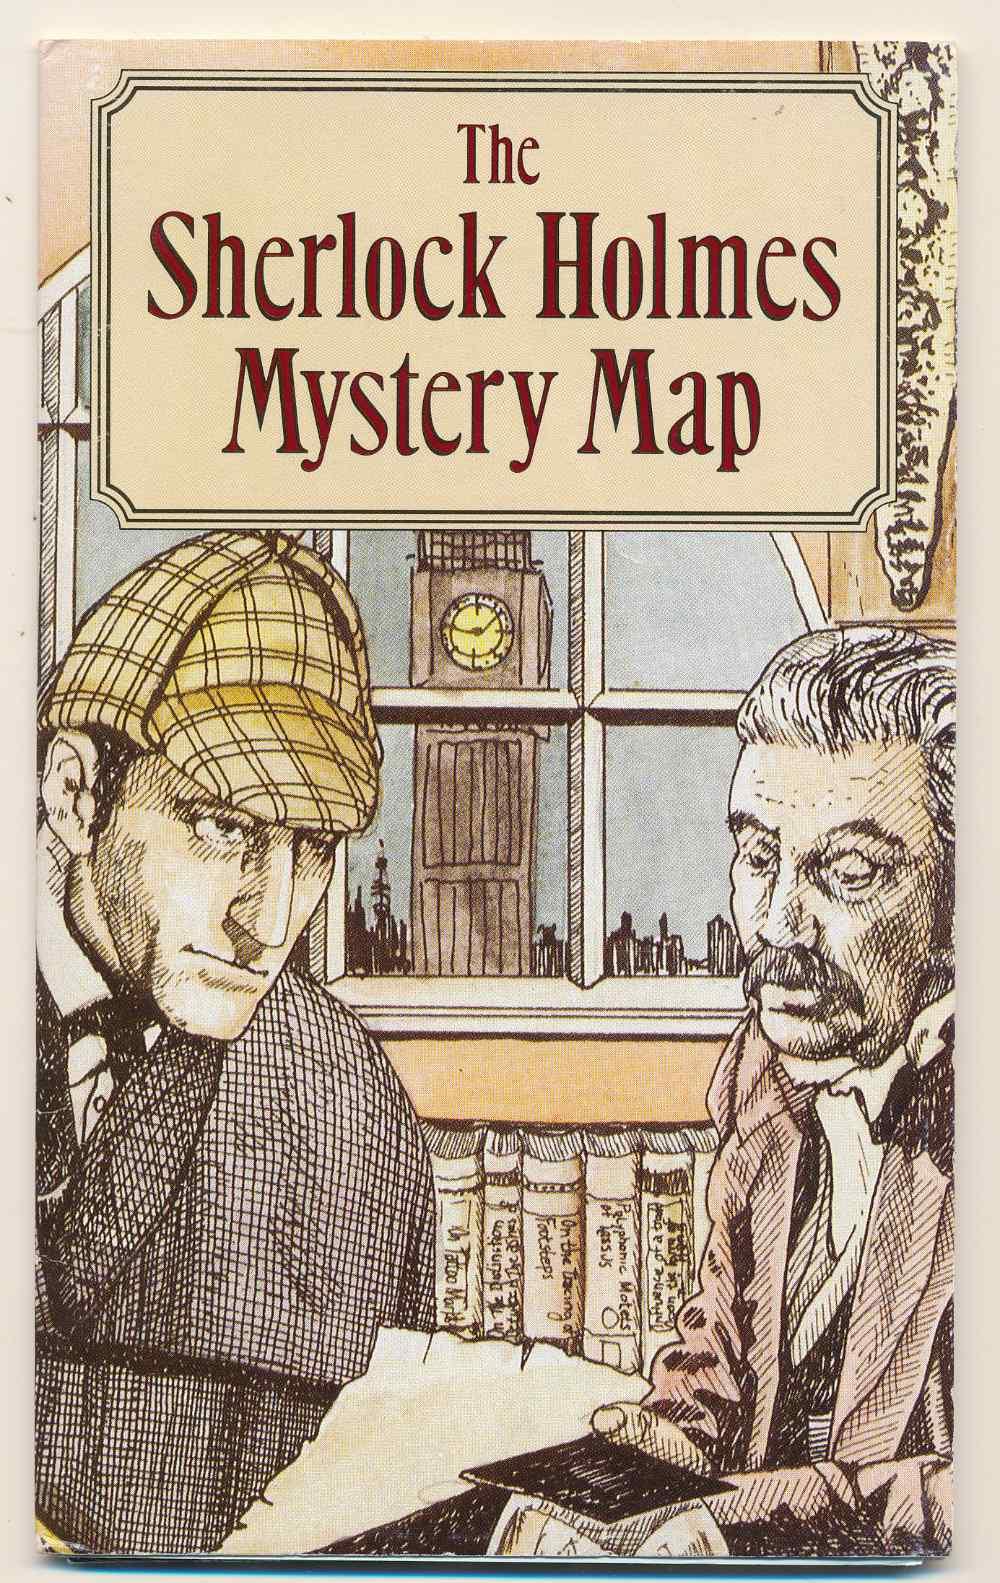 The Sherlock Holmes mystery map